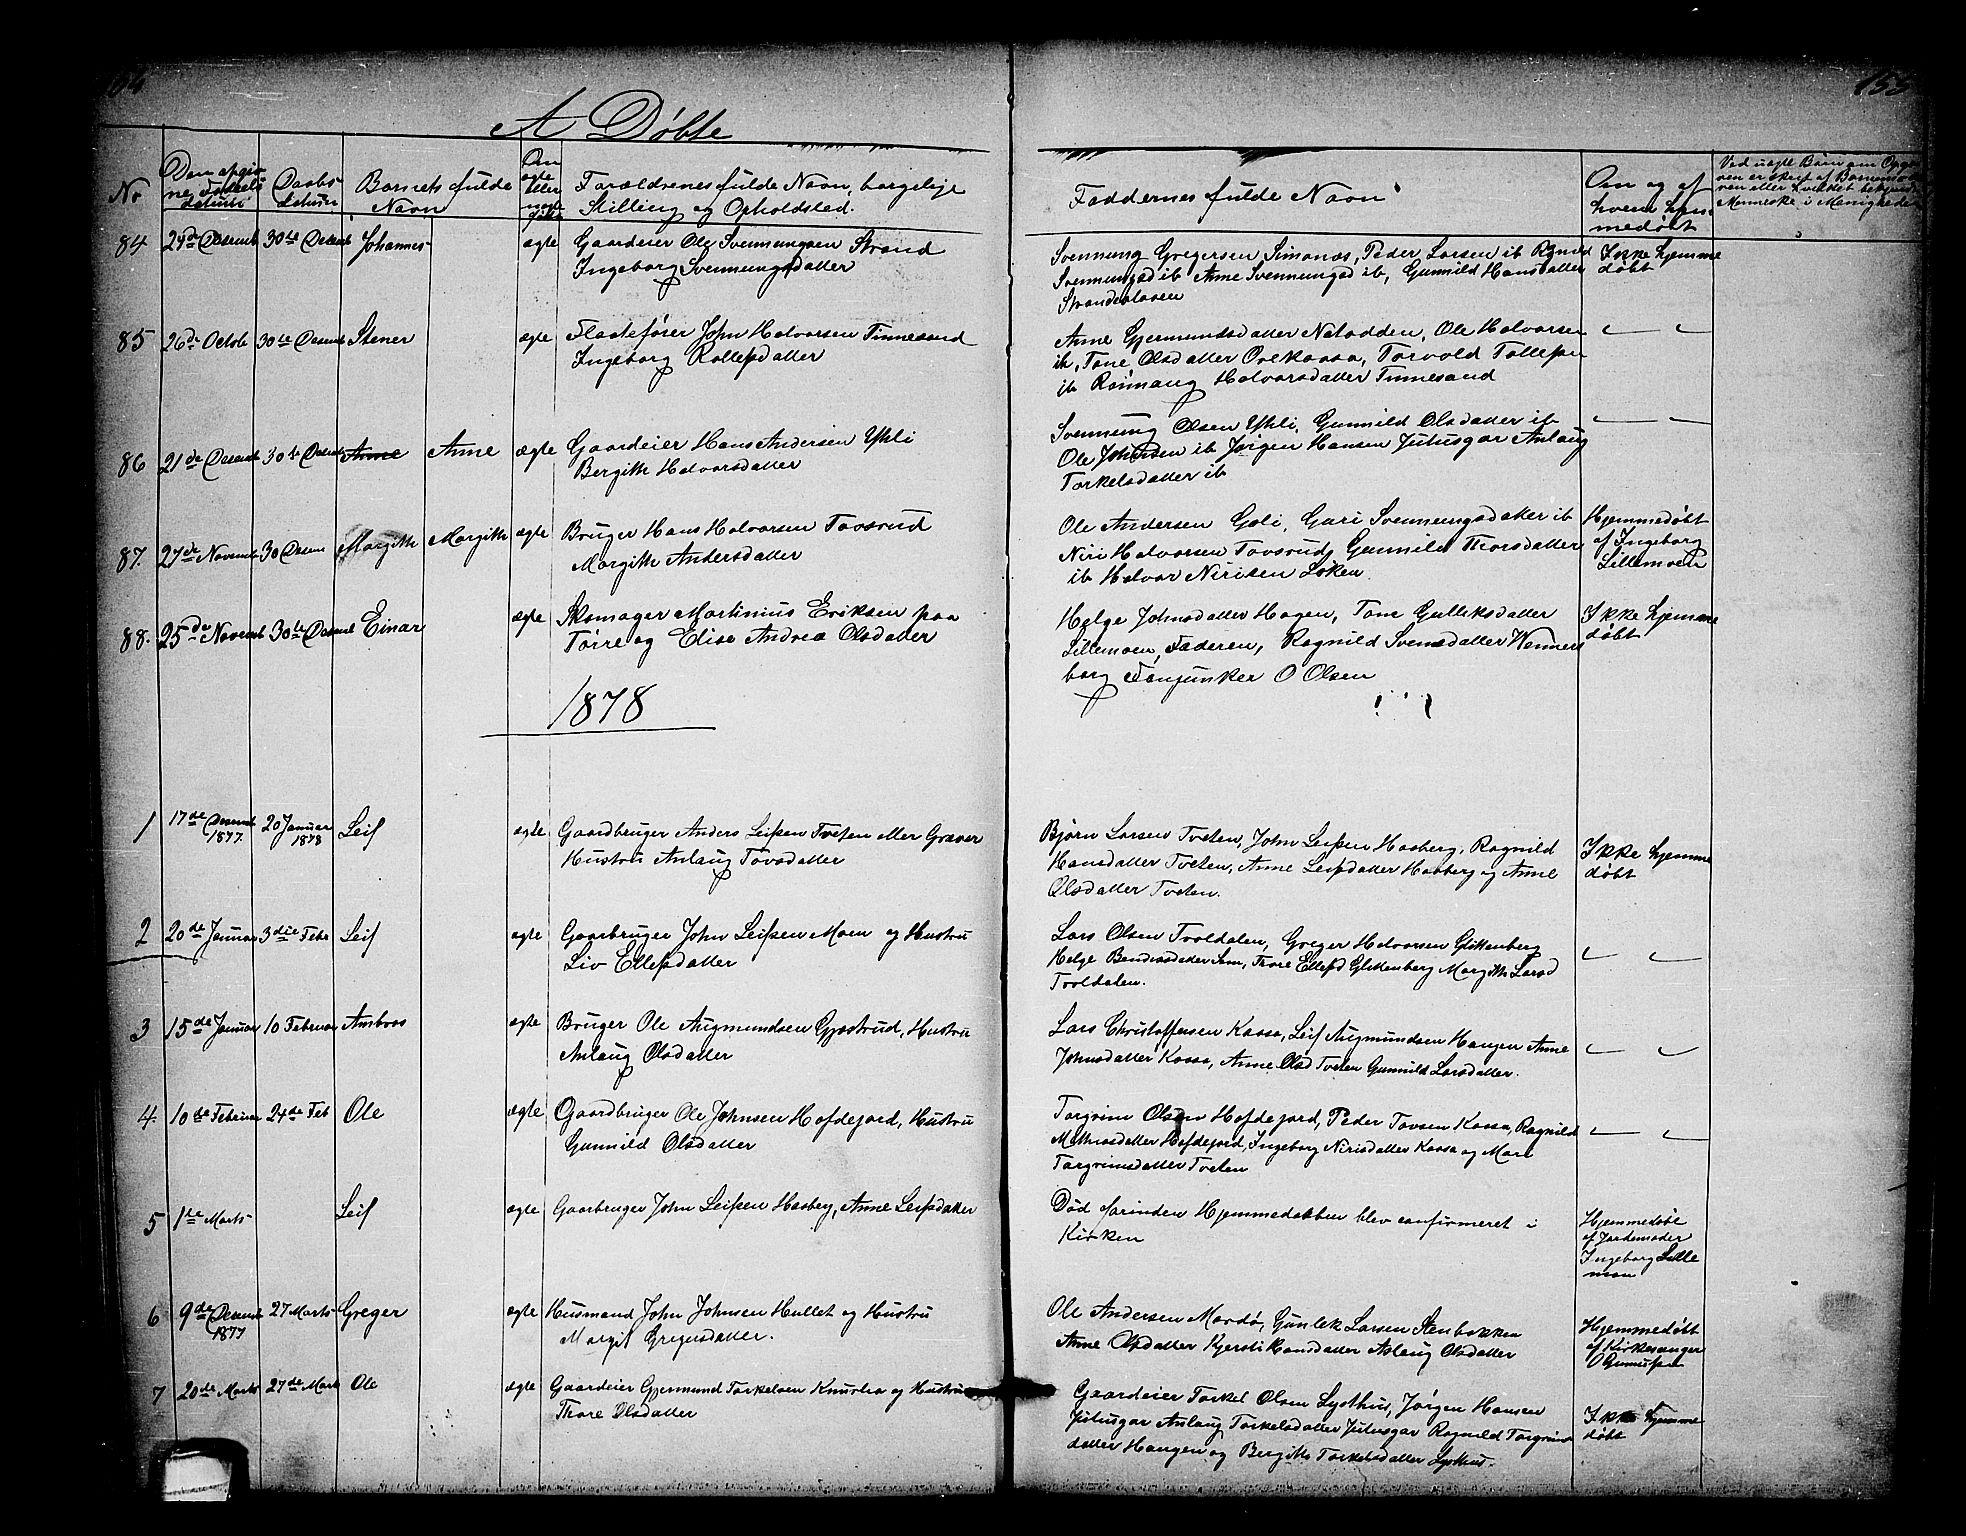 SAKO, Heddal kirkebøker, G/Ga/L0001: Klokkerbok nr. I 1, 1866-1878, s. 154-155